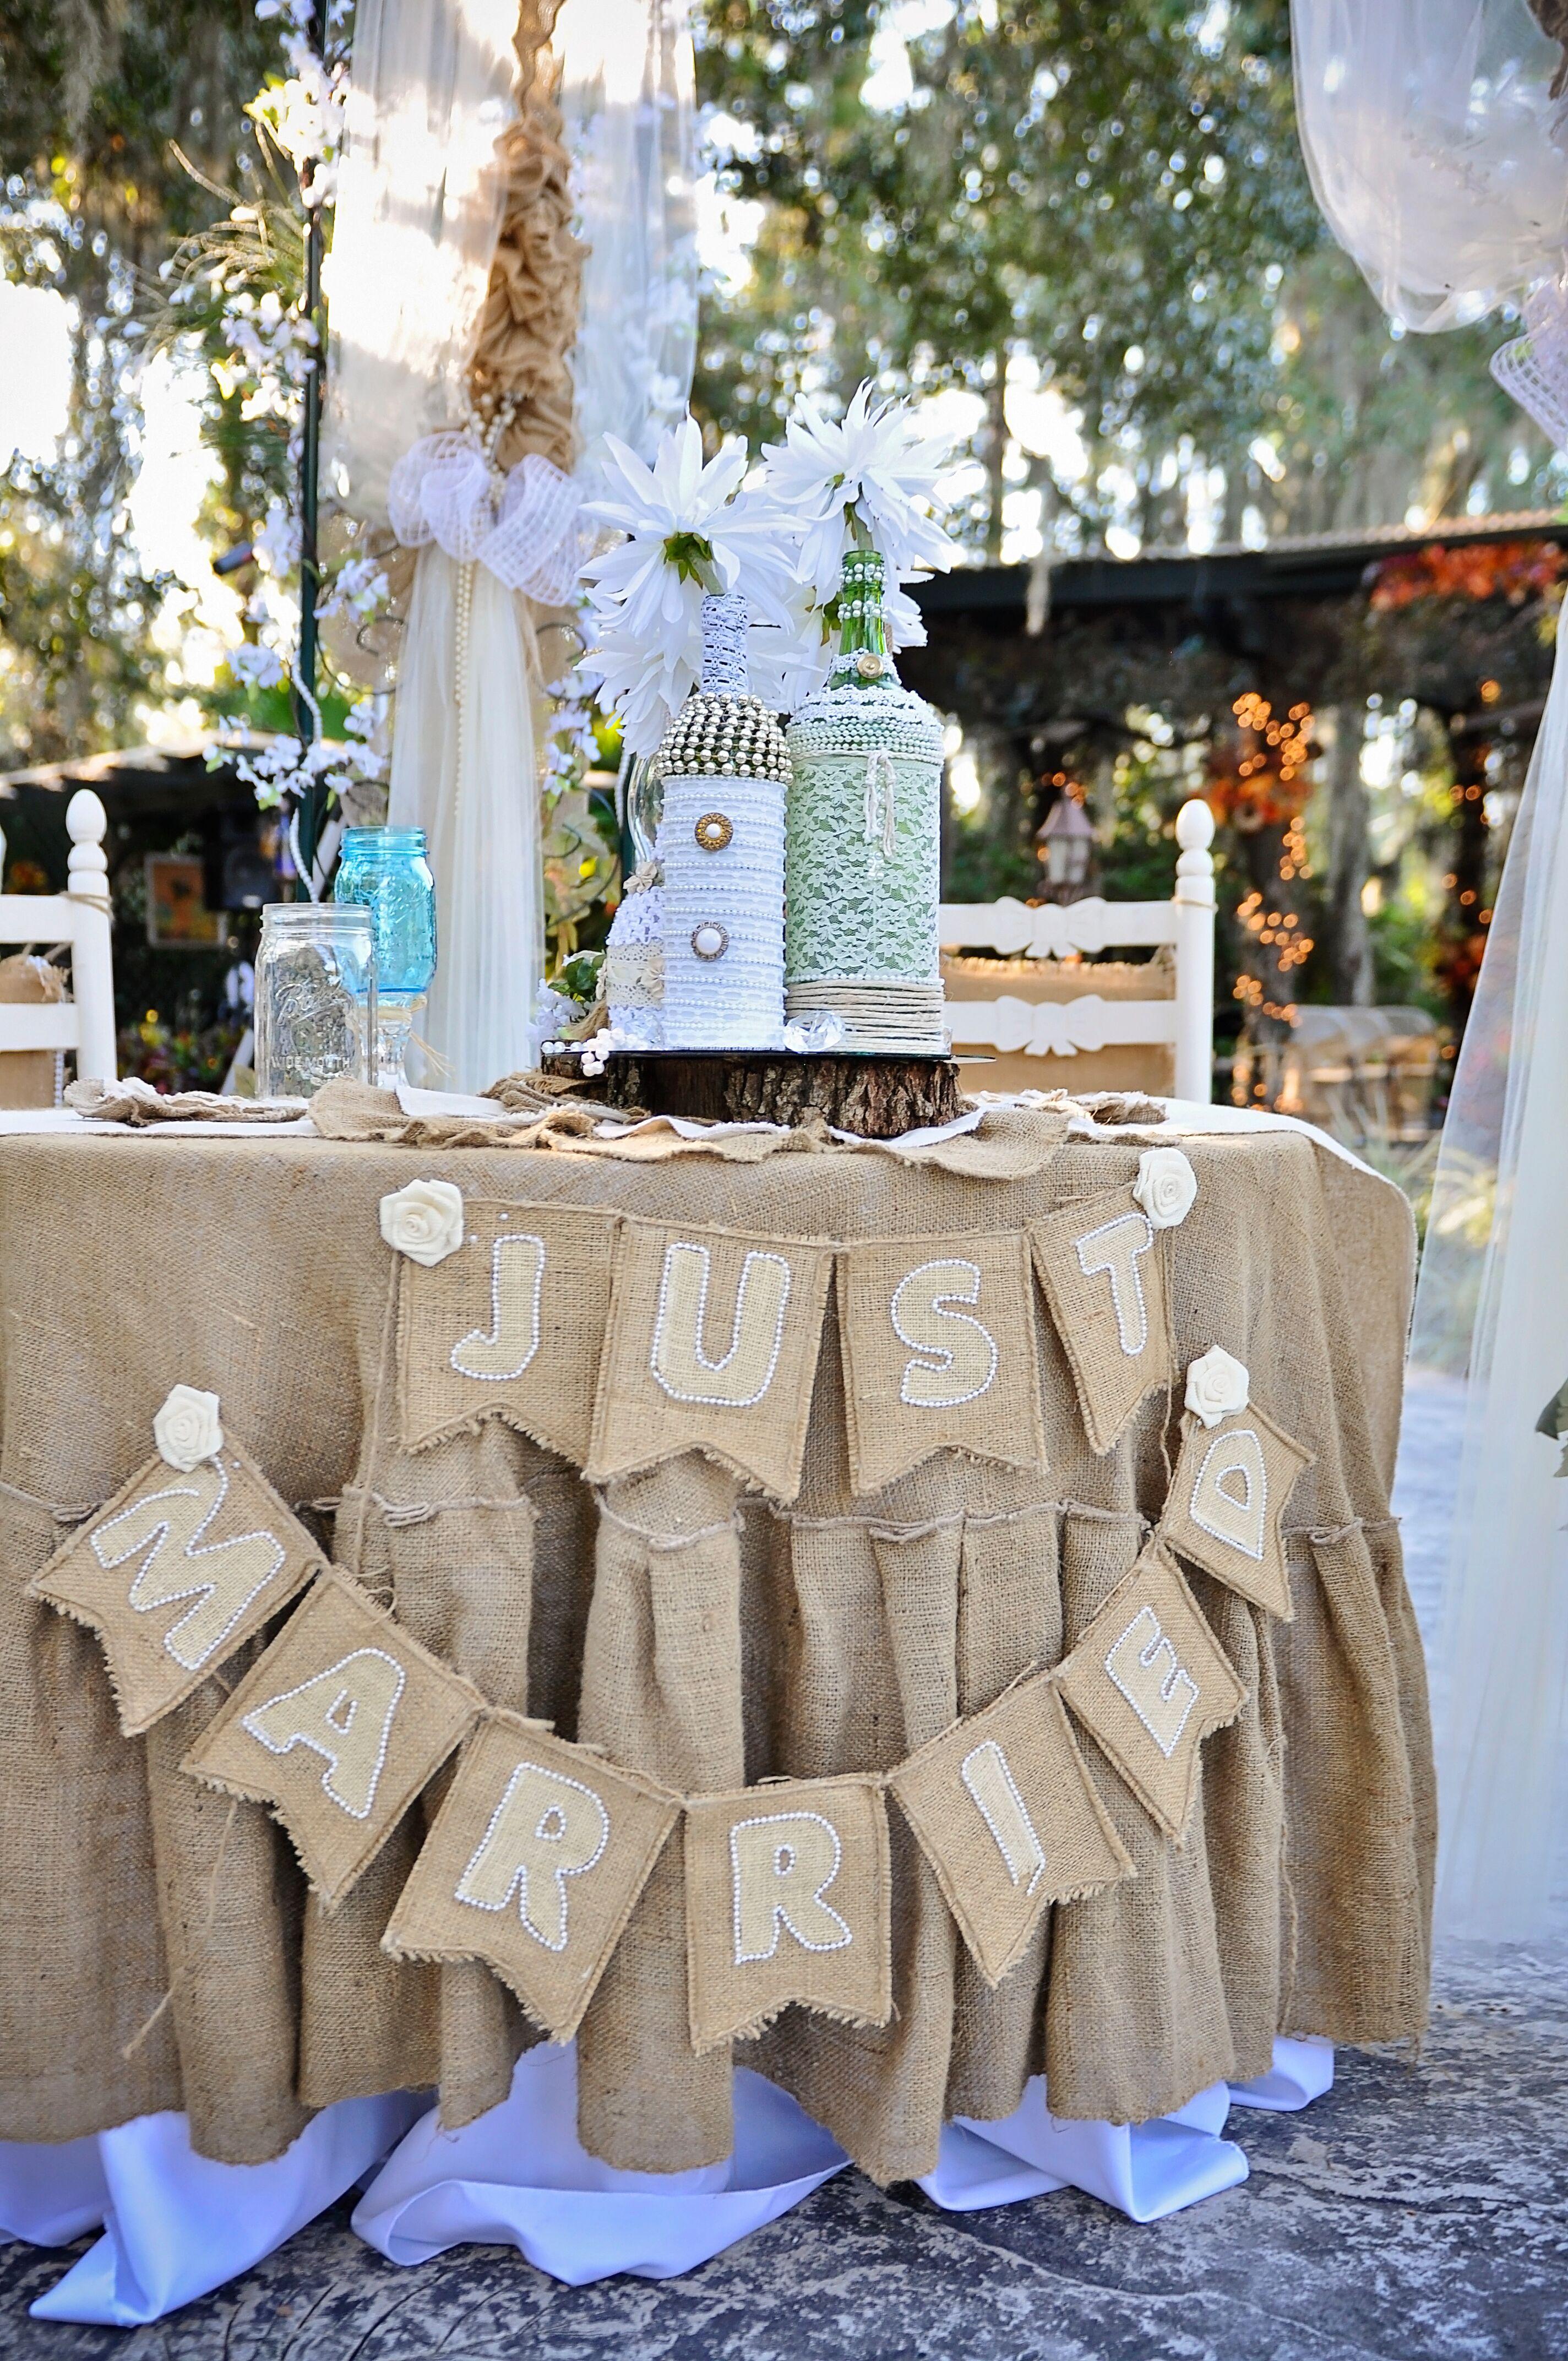 DIY Burlap Sweetheart Table Linens, Banner